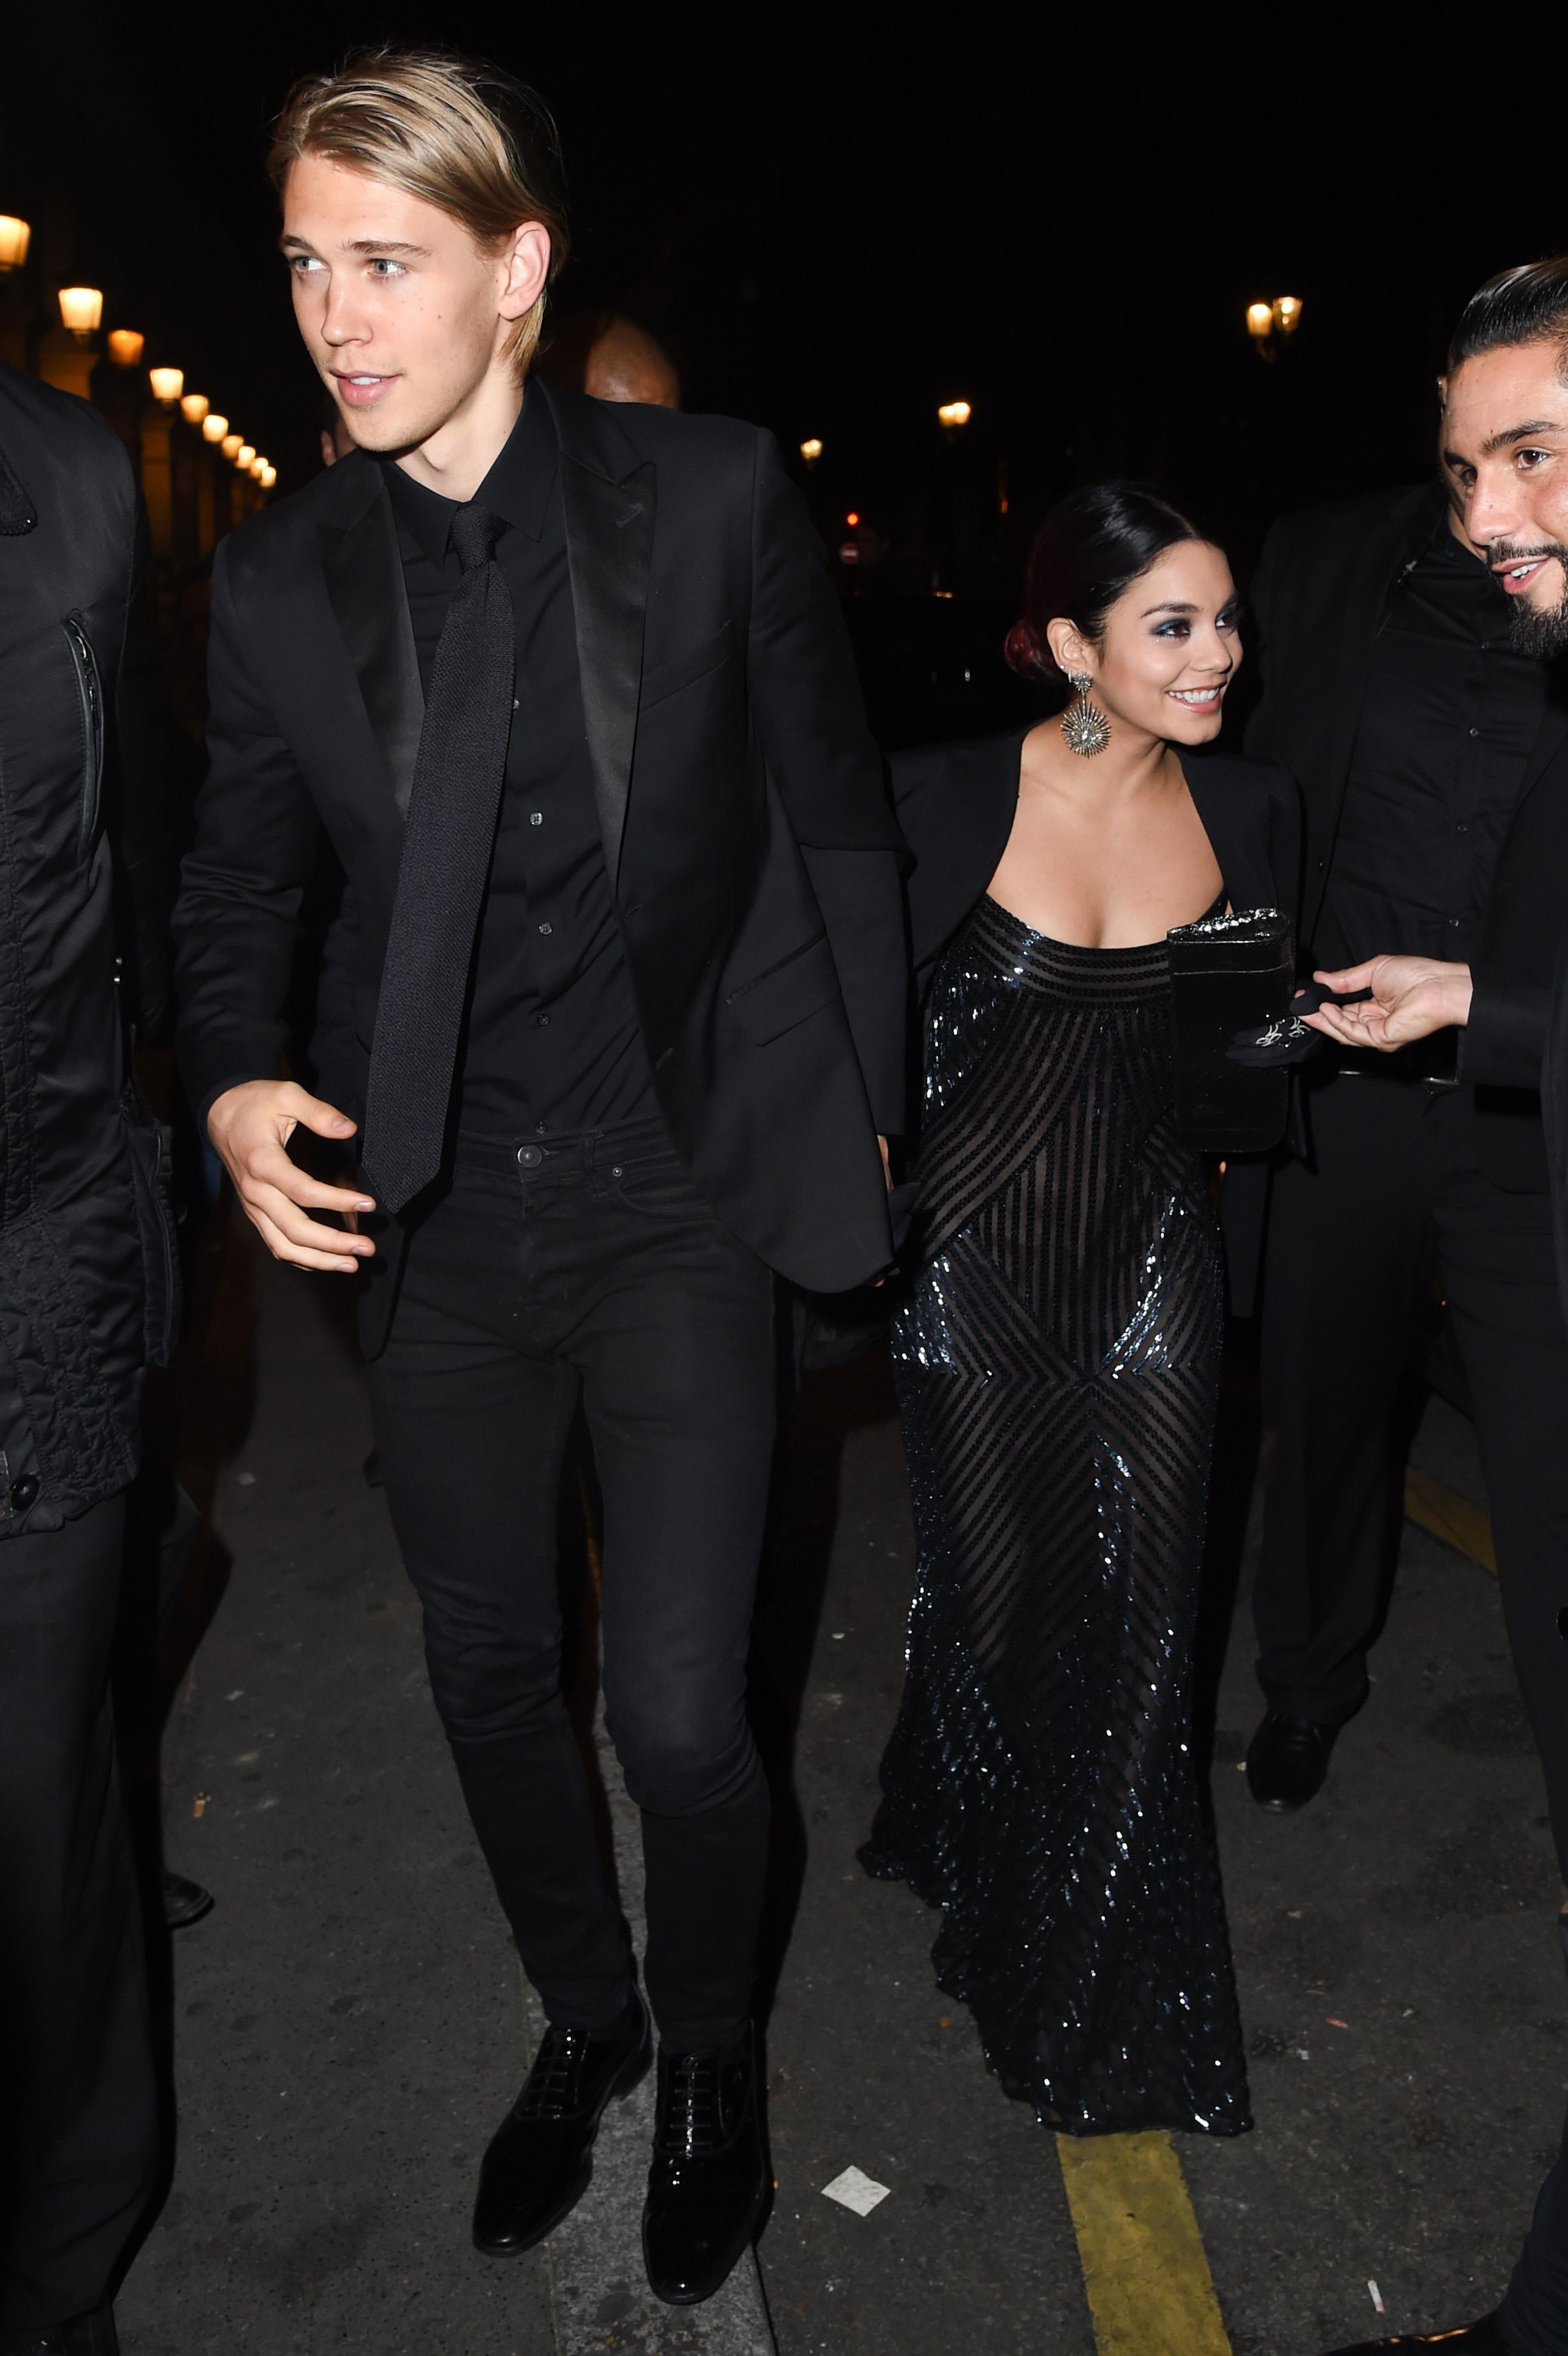 Vanessa Hudgens and Austin Butler seen at the VIP Room in Paris